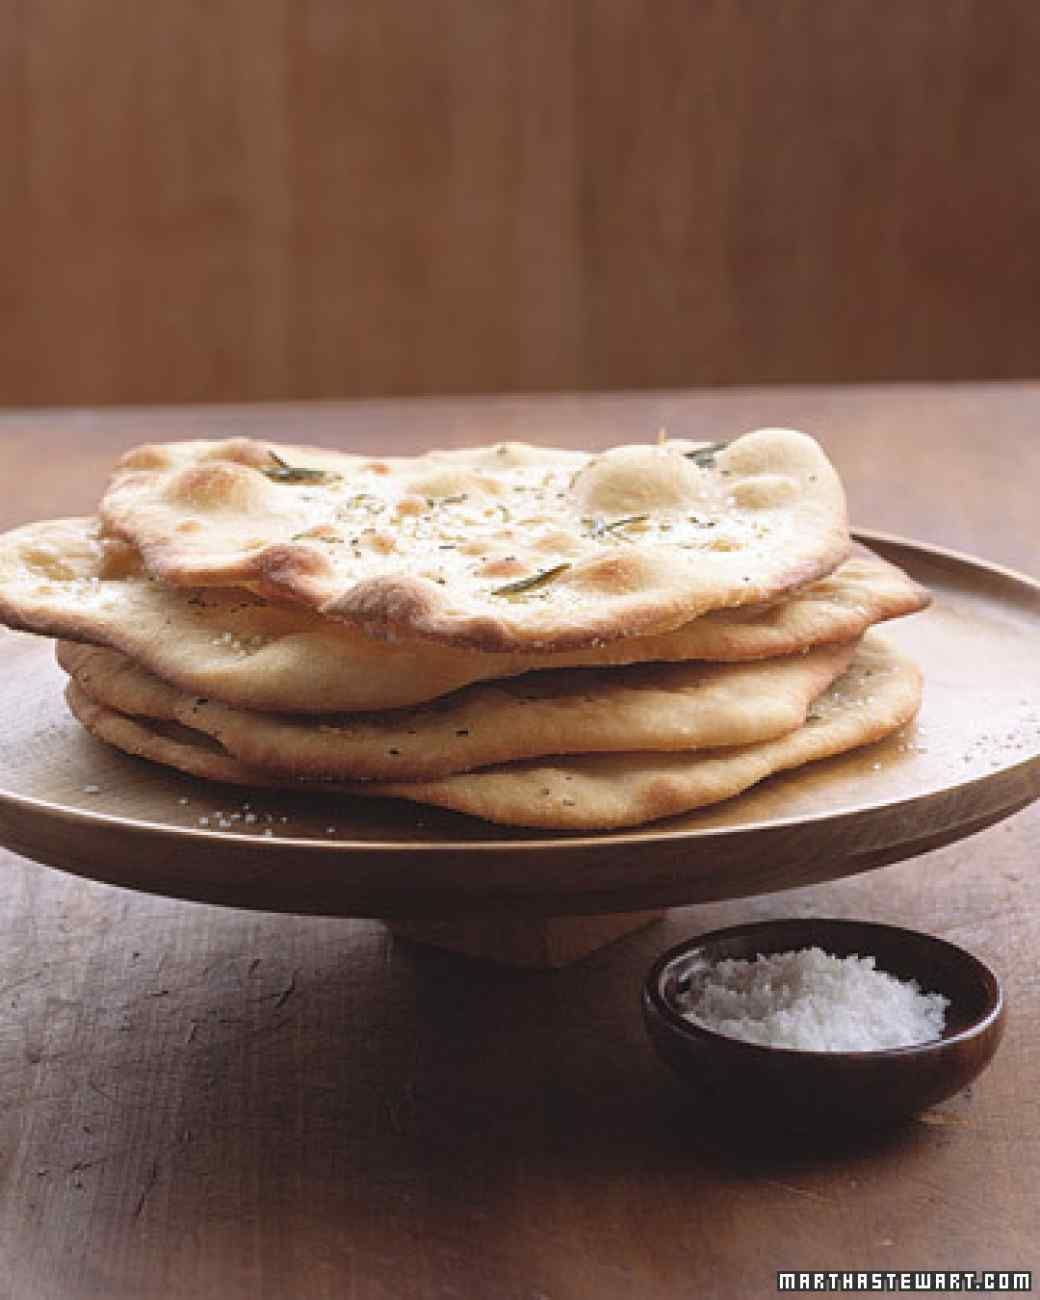 Garlic-Rosemary Flatbread from purchased pizza dough - Martha Stewart